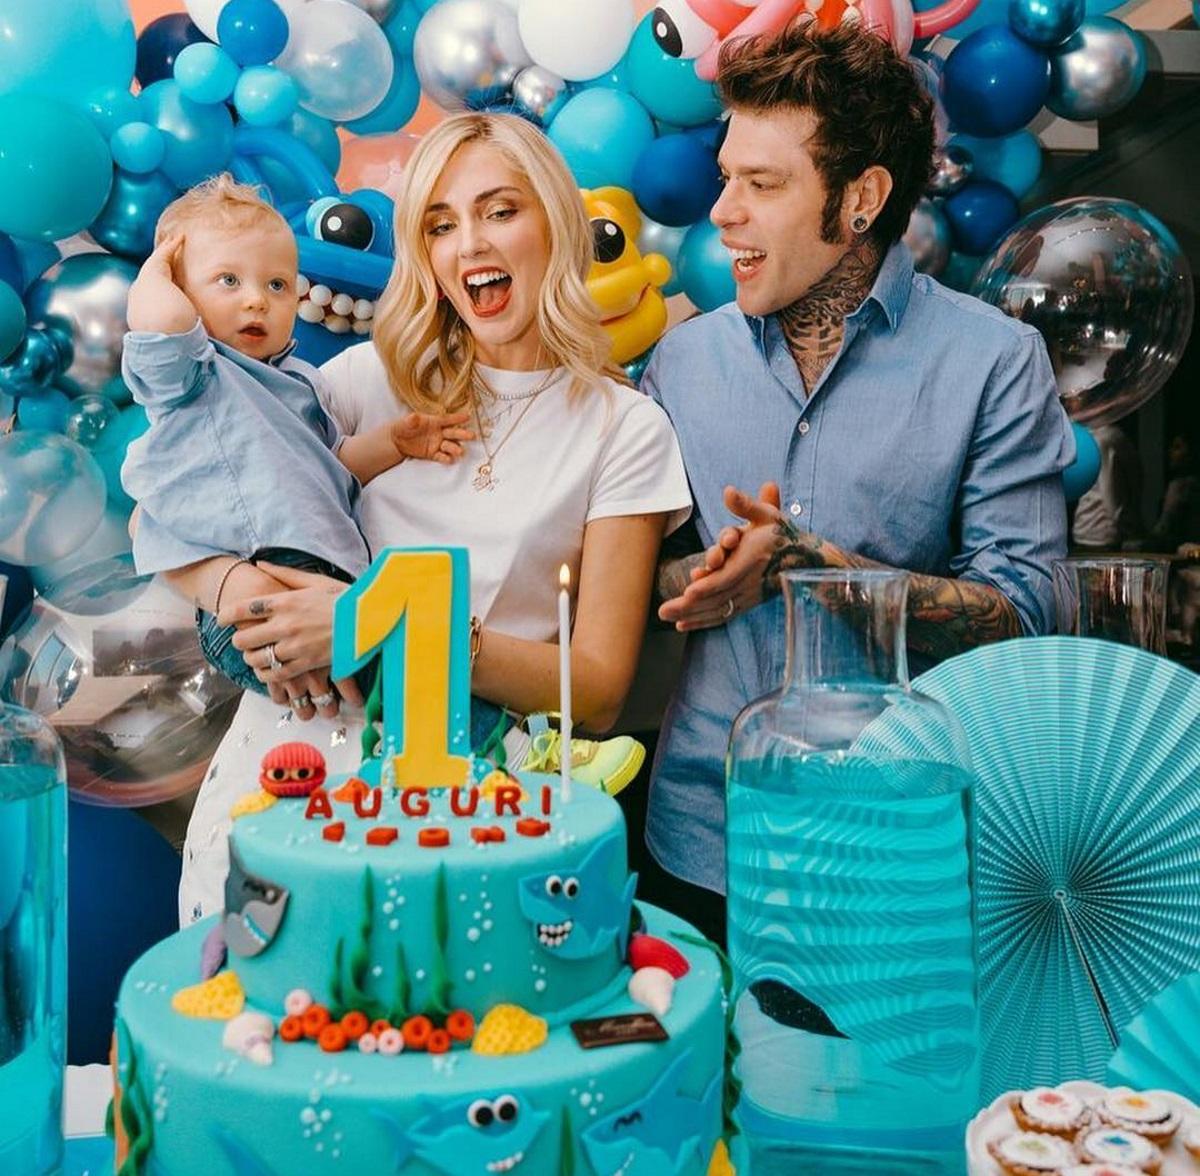 Chiara Ferragni: Πάρτι-υπερπαραγωγή για τα πρώτα γενέθλια του γιου της! Φωτογραφίες